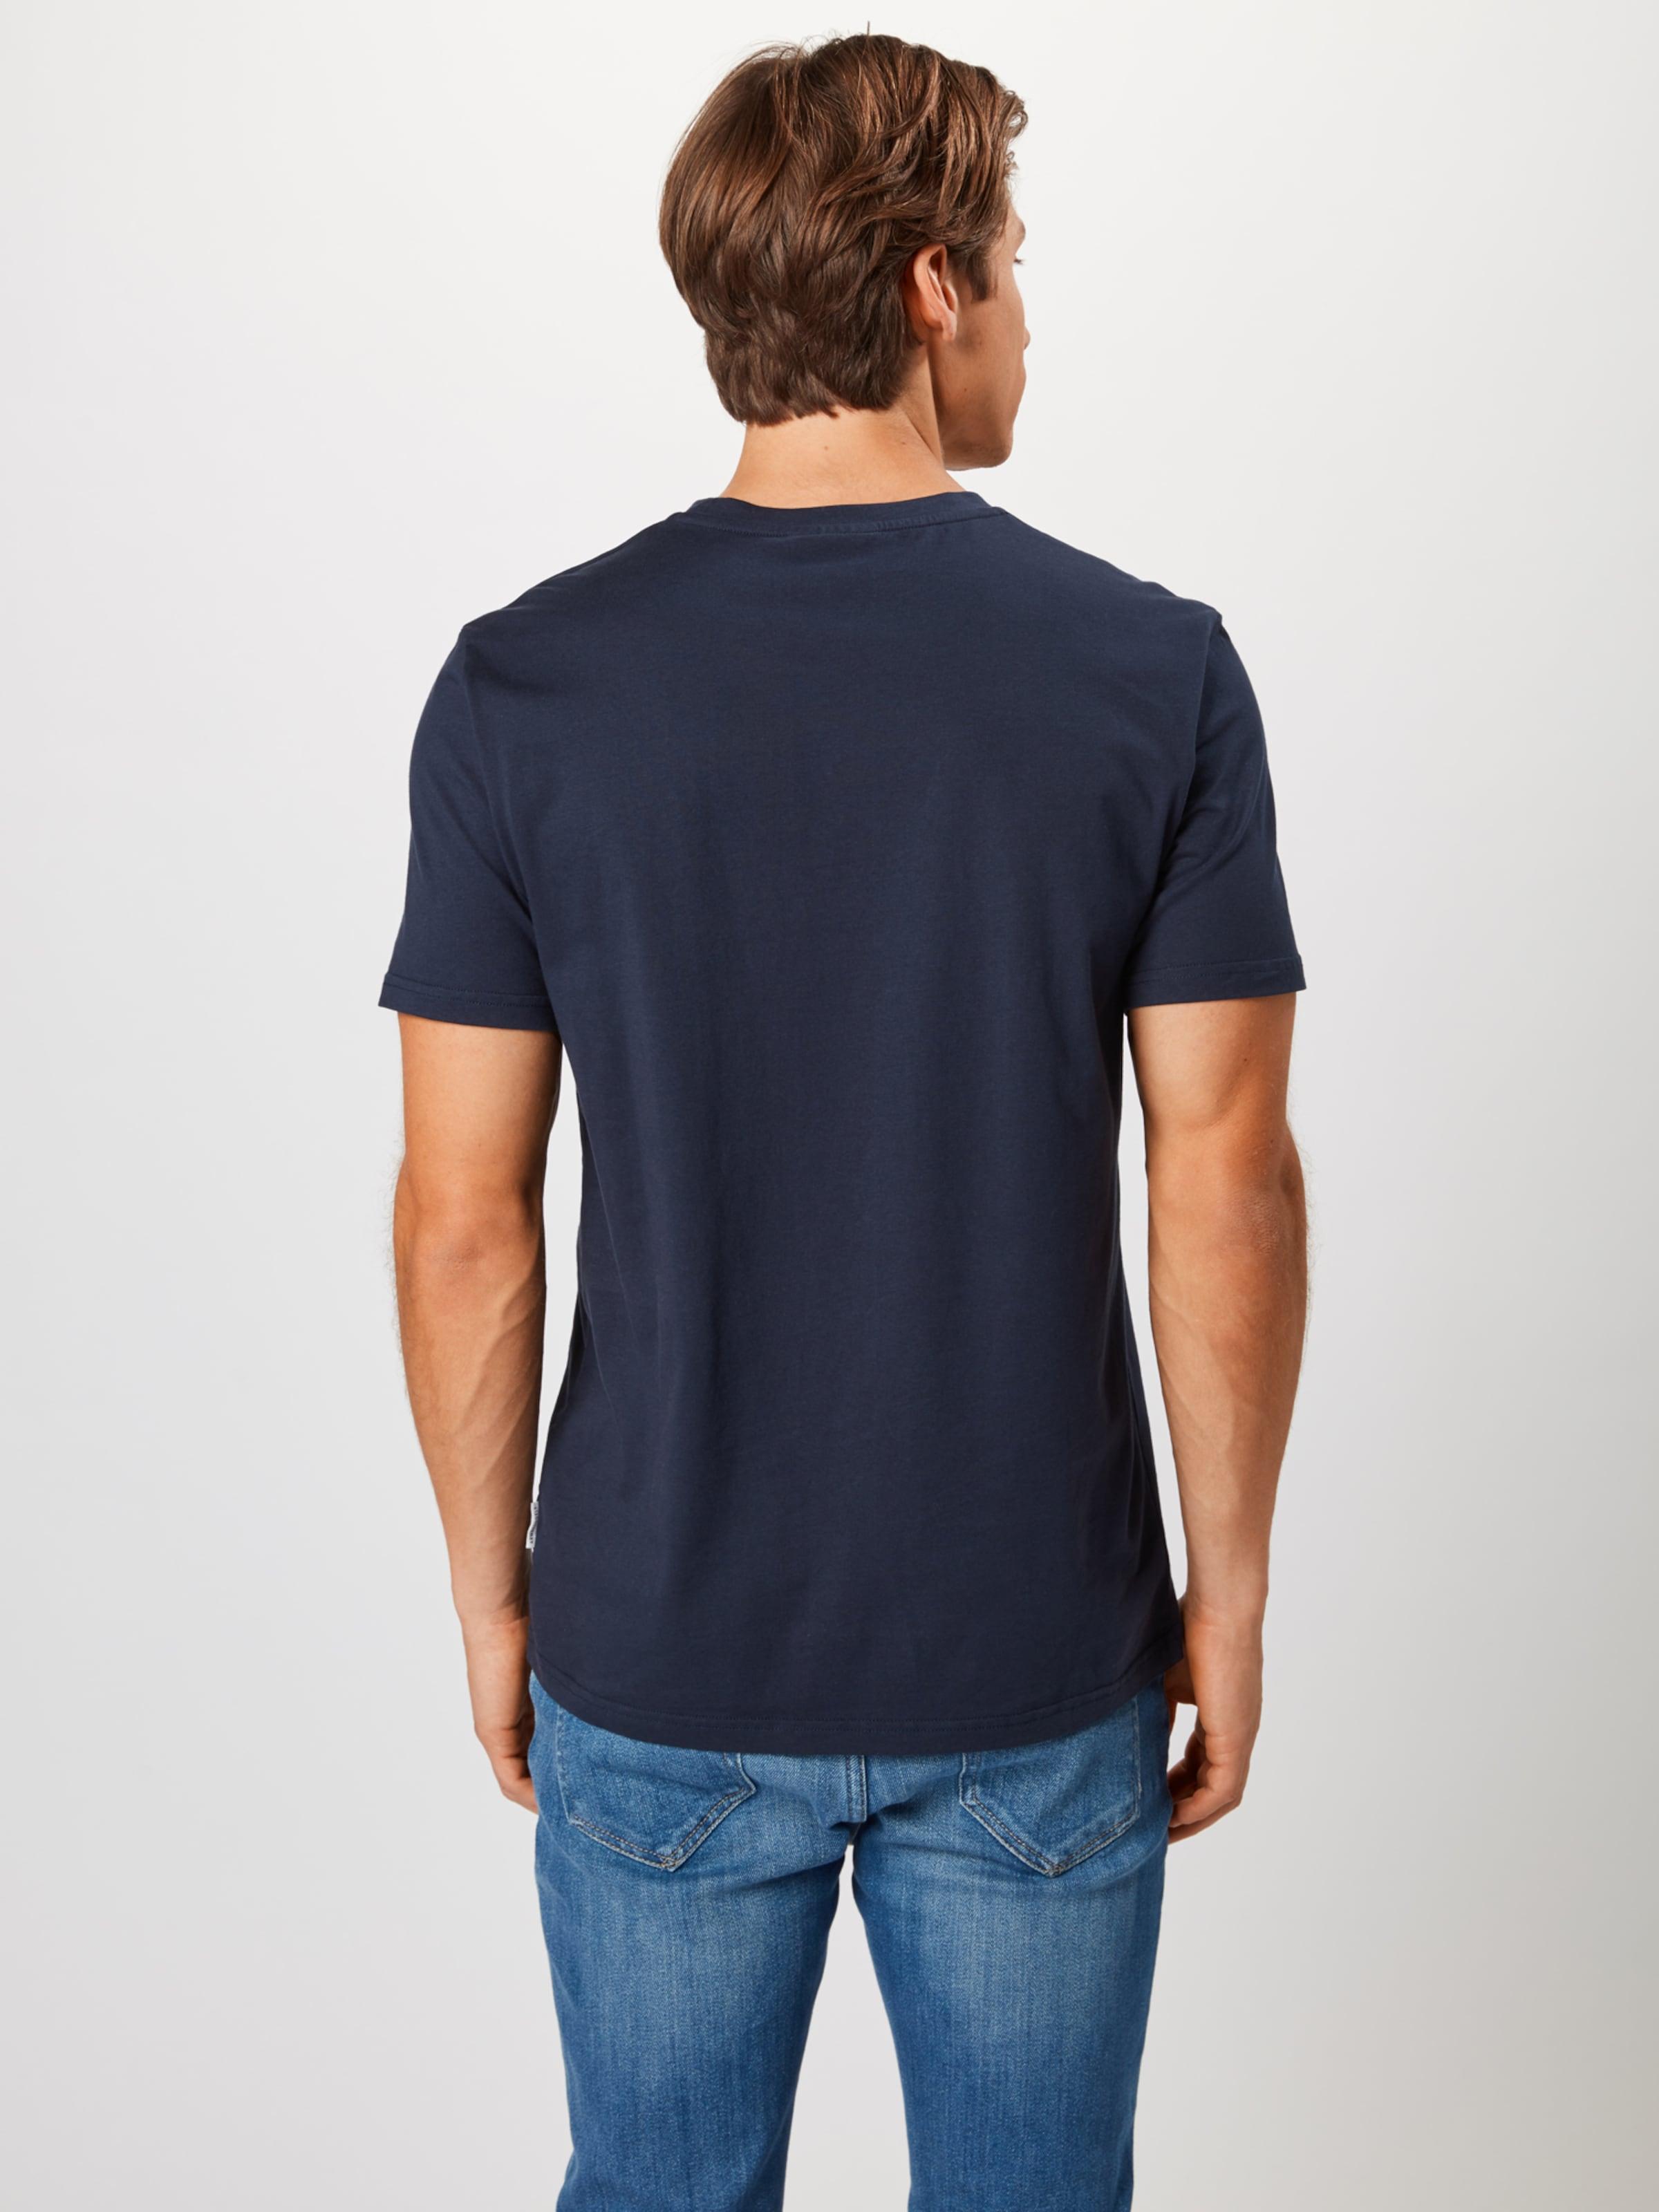 En Marine shirt Bike Chaos' Bleu Armedangels T 'jaames ZiuPkX